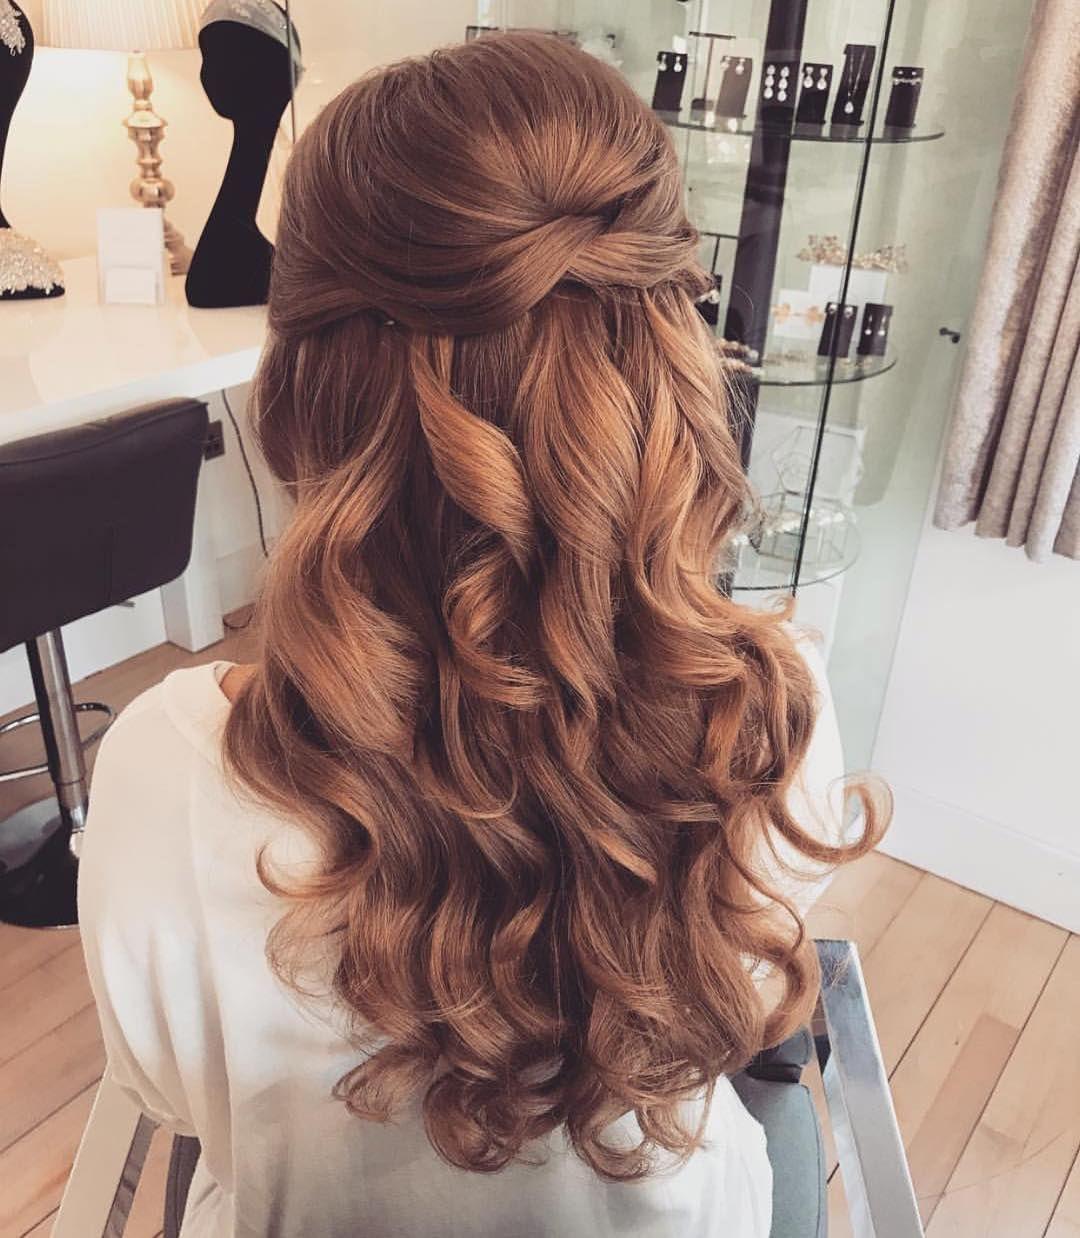 39 Gorgeous Half Up Half Down Hairstyles Hair Styles Long Hair Styles Down Hairstyles